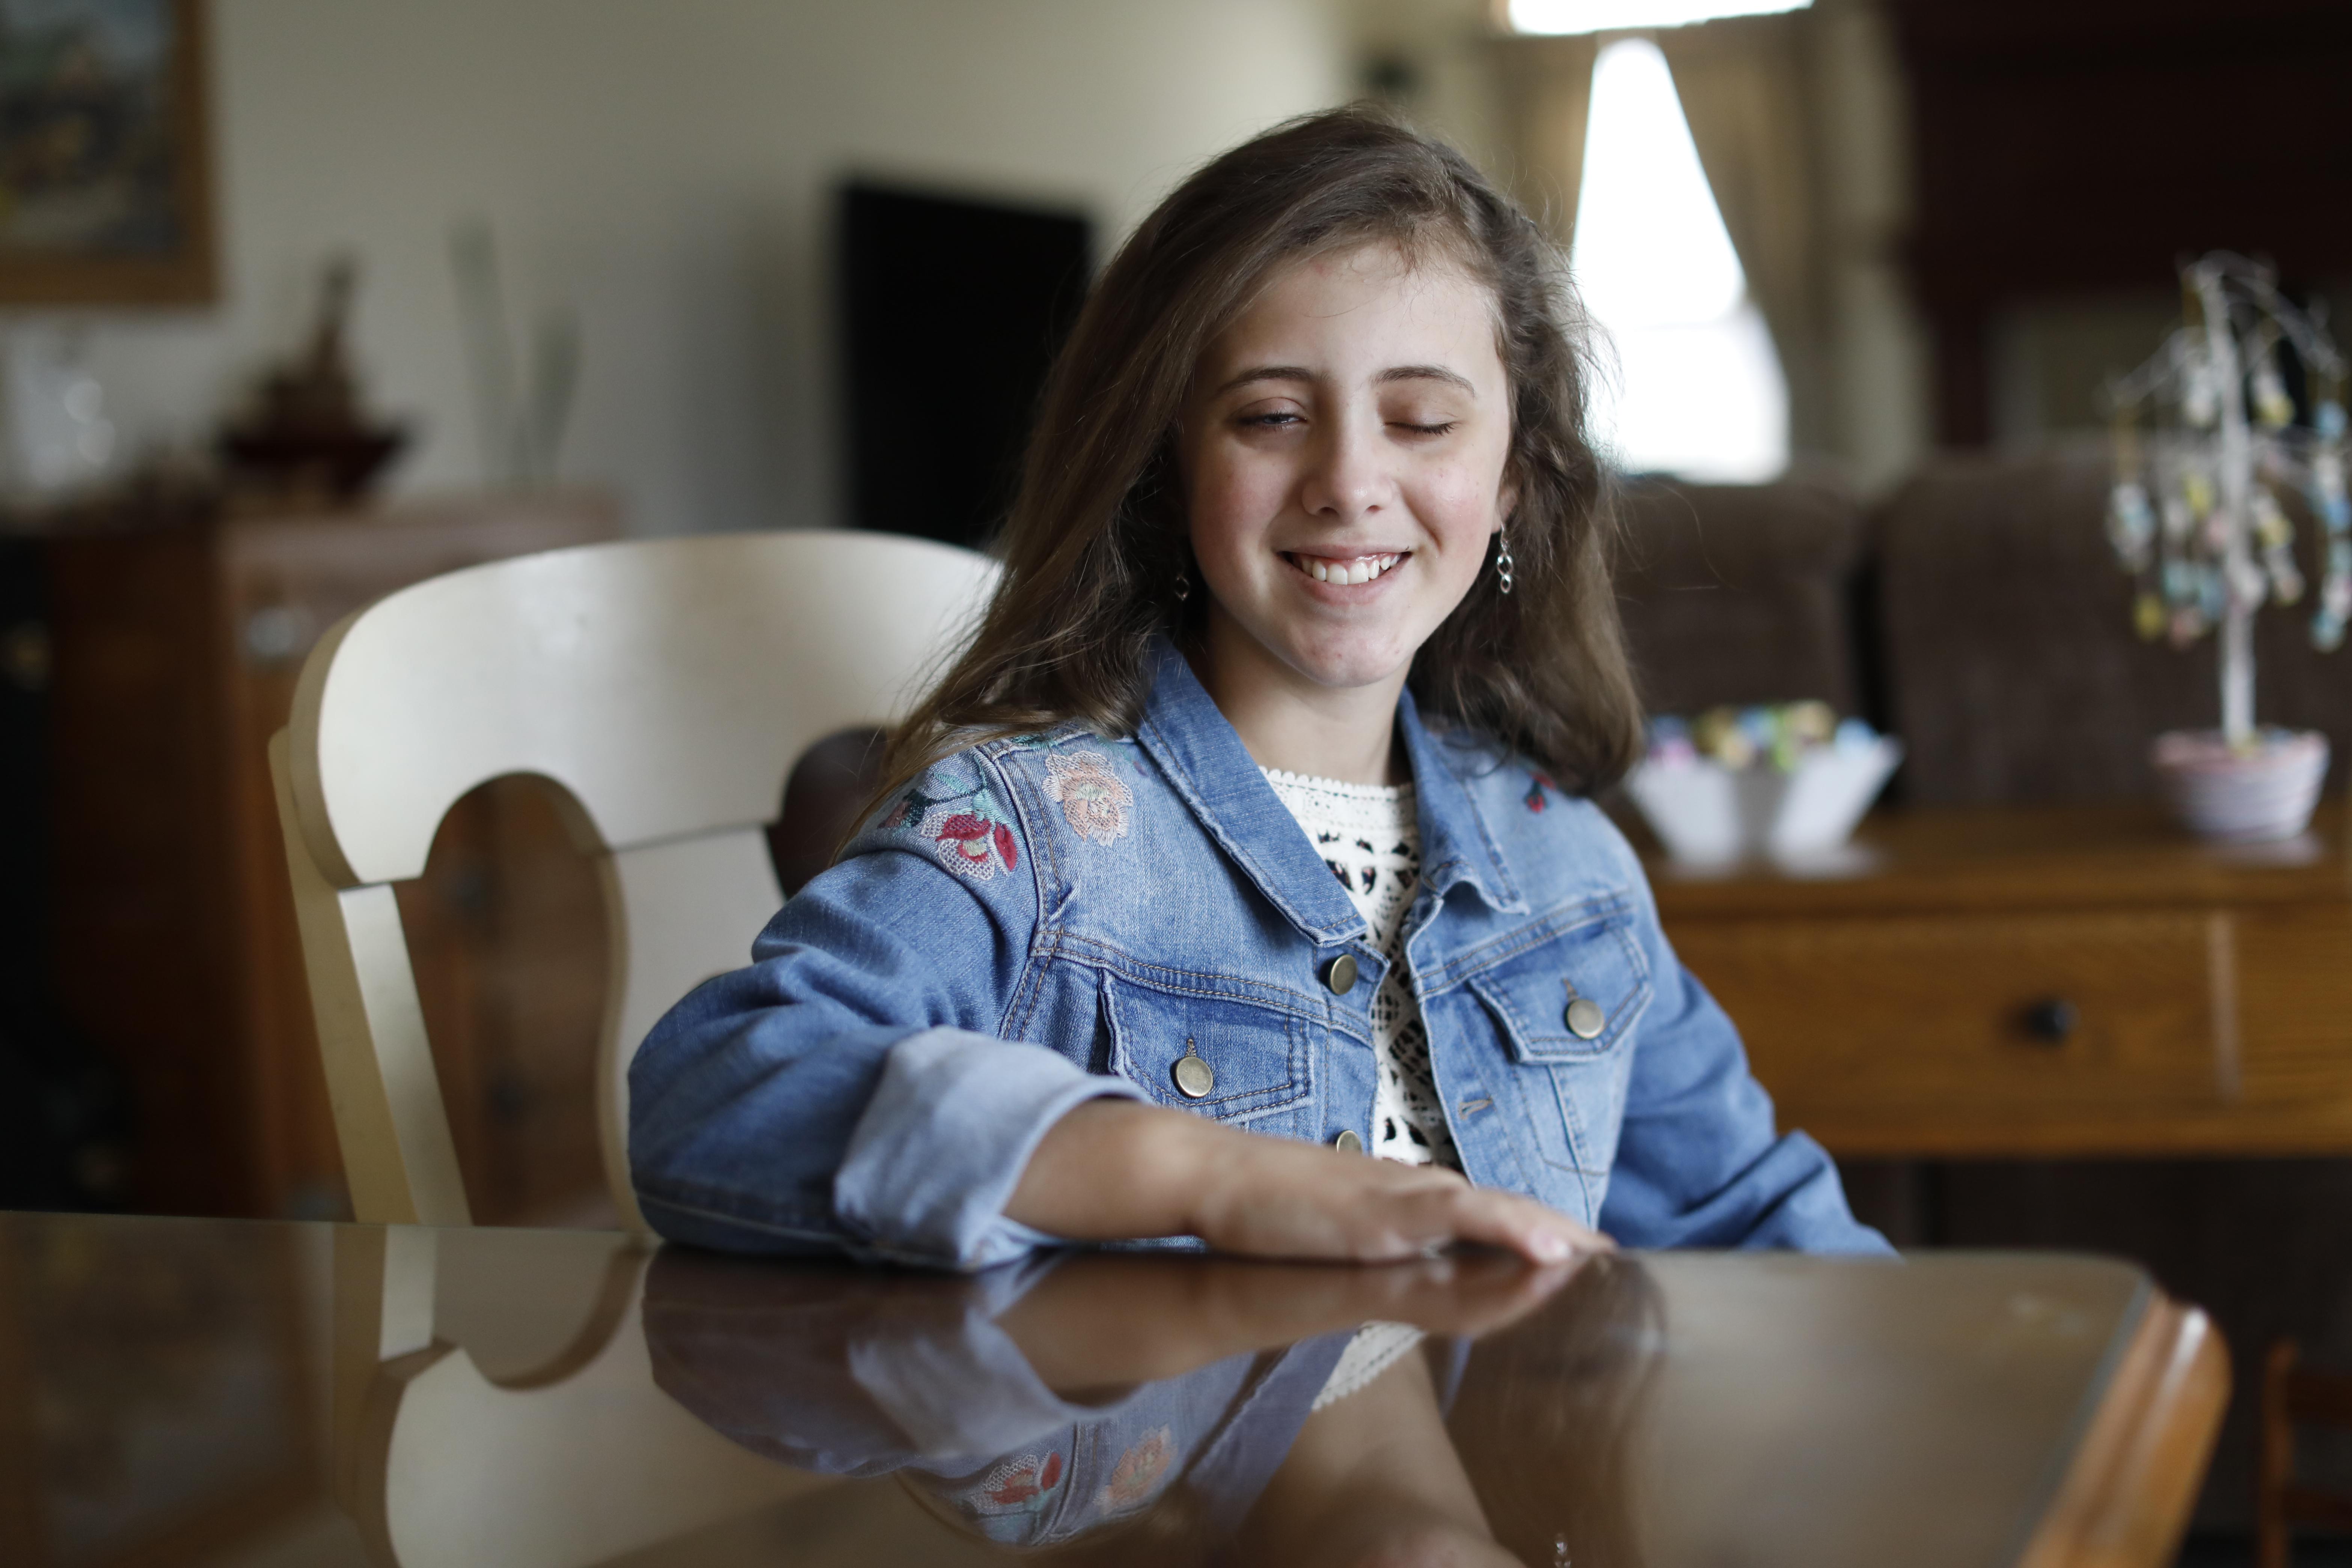 Annie Leeds, 12, of Lockport has severe mitochondrial disorder. (Derek Gee/Buffalo News)